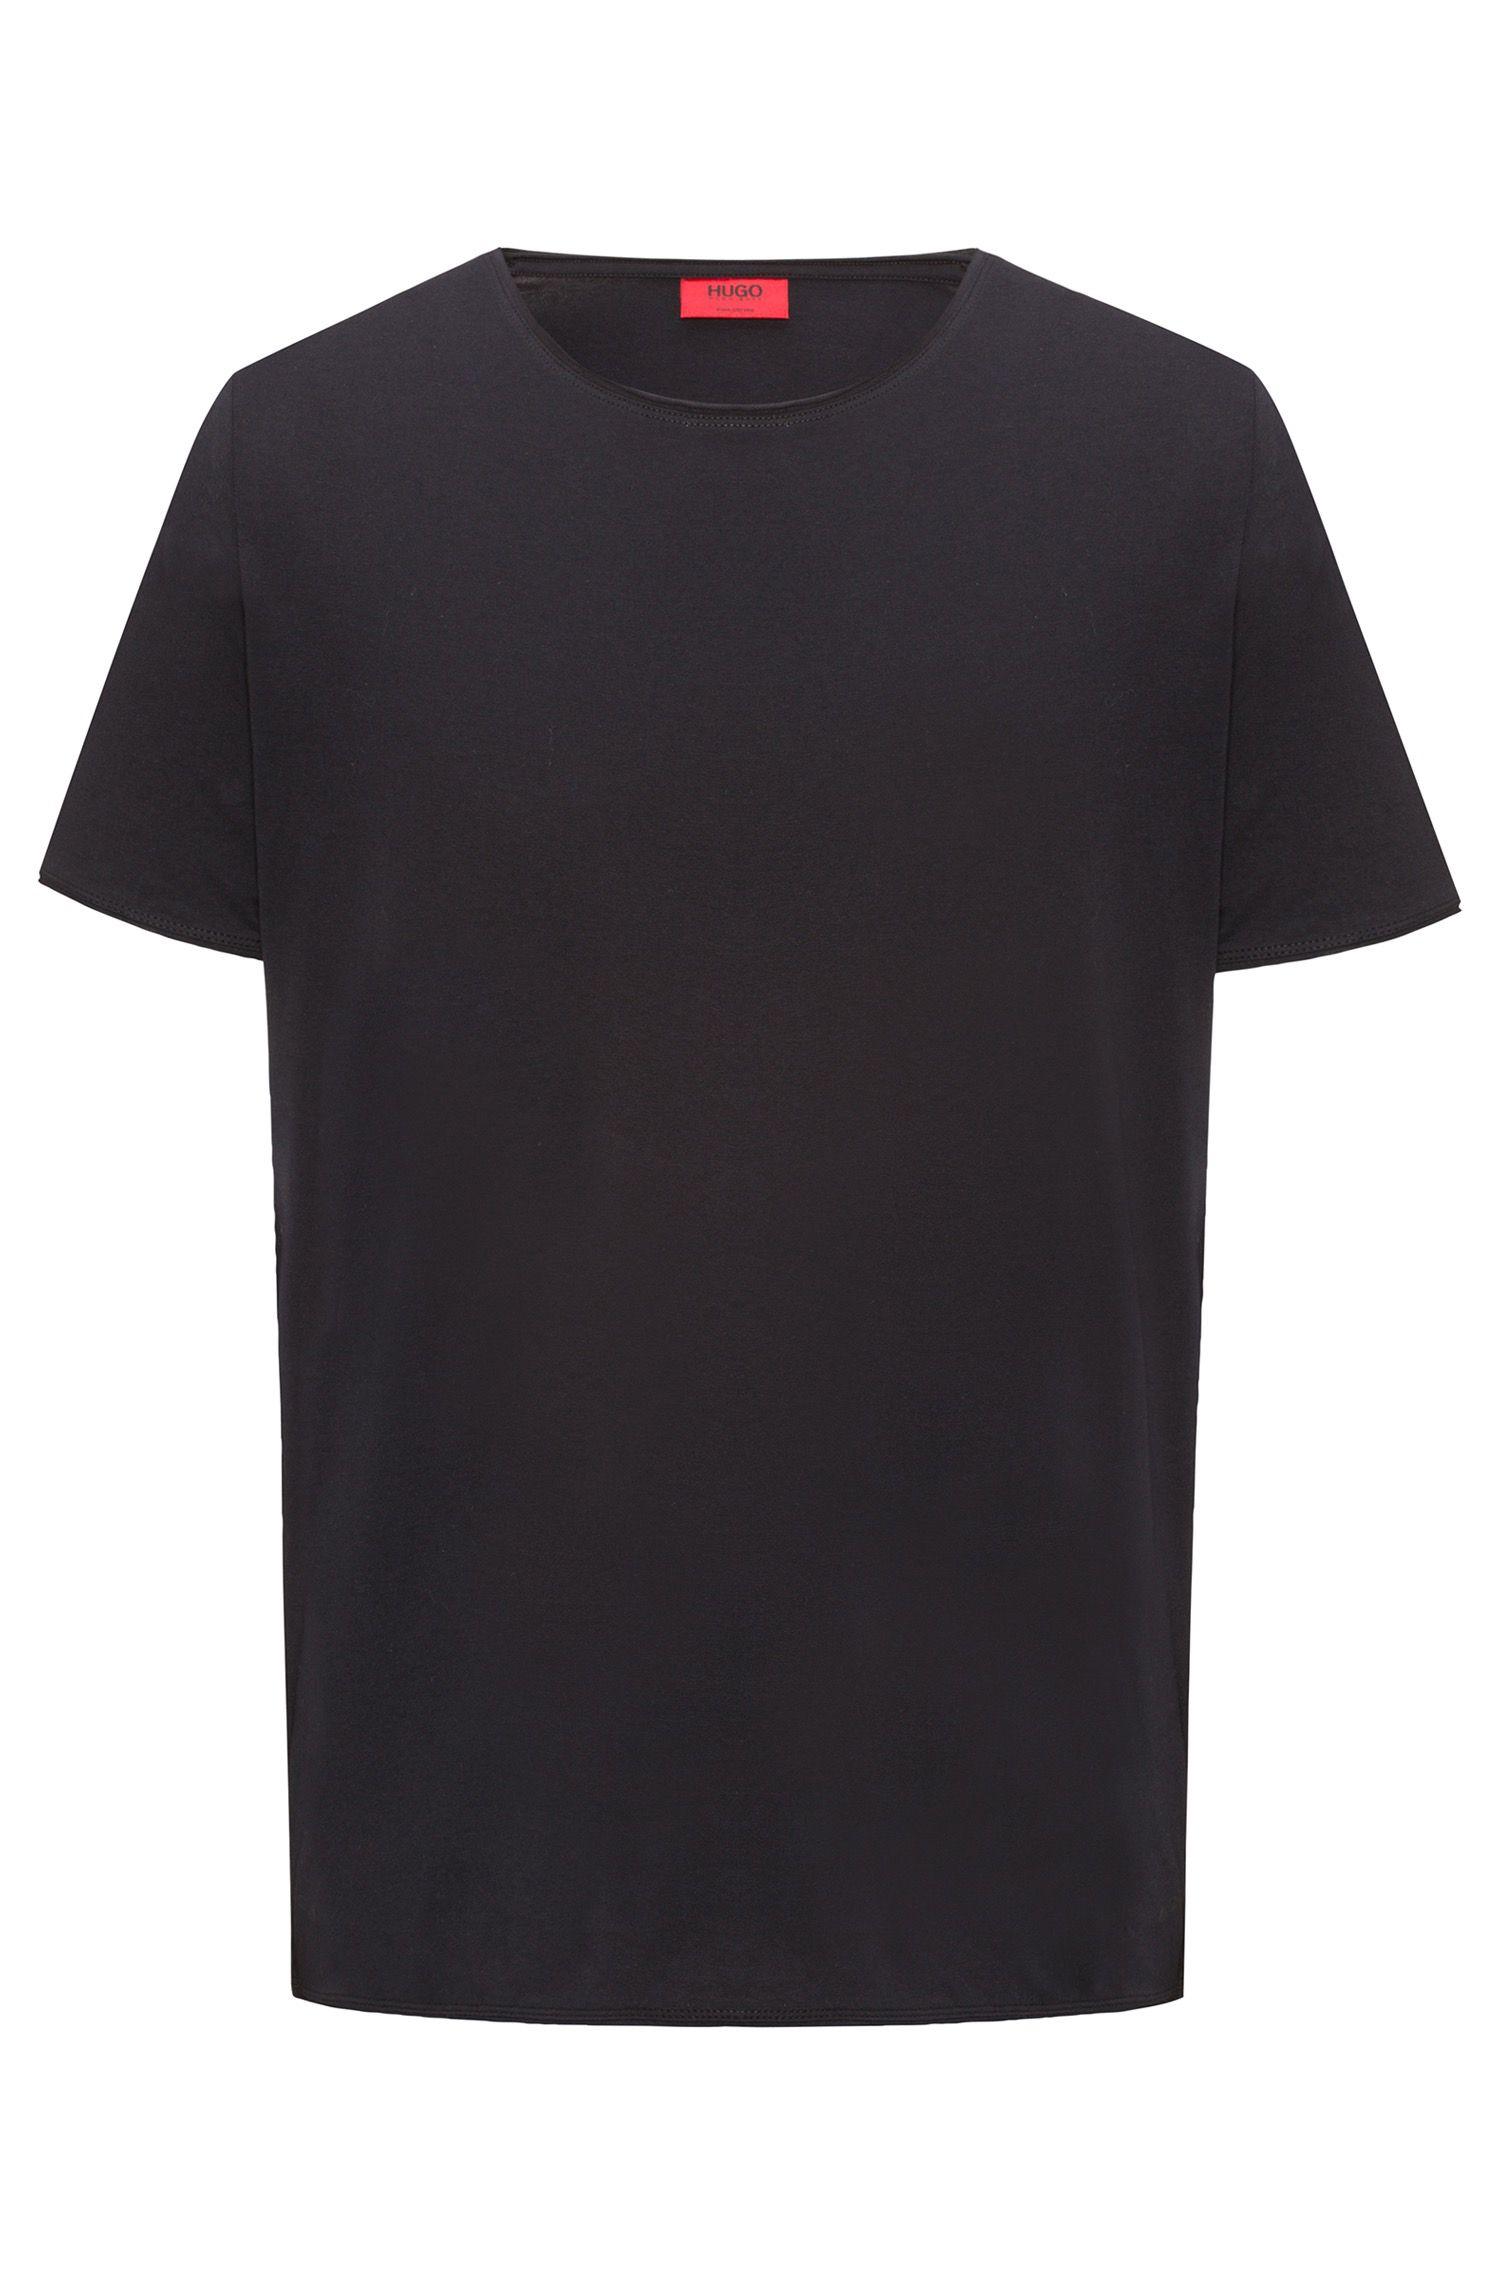 Camiseta regular fit en algodón Pima